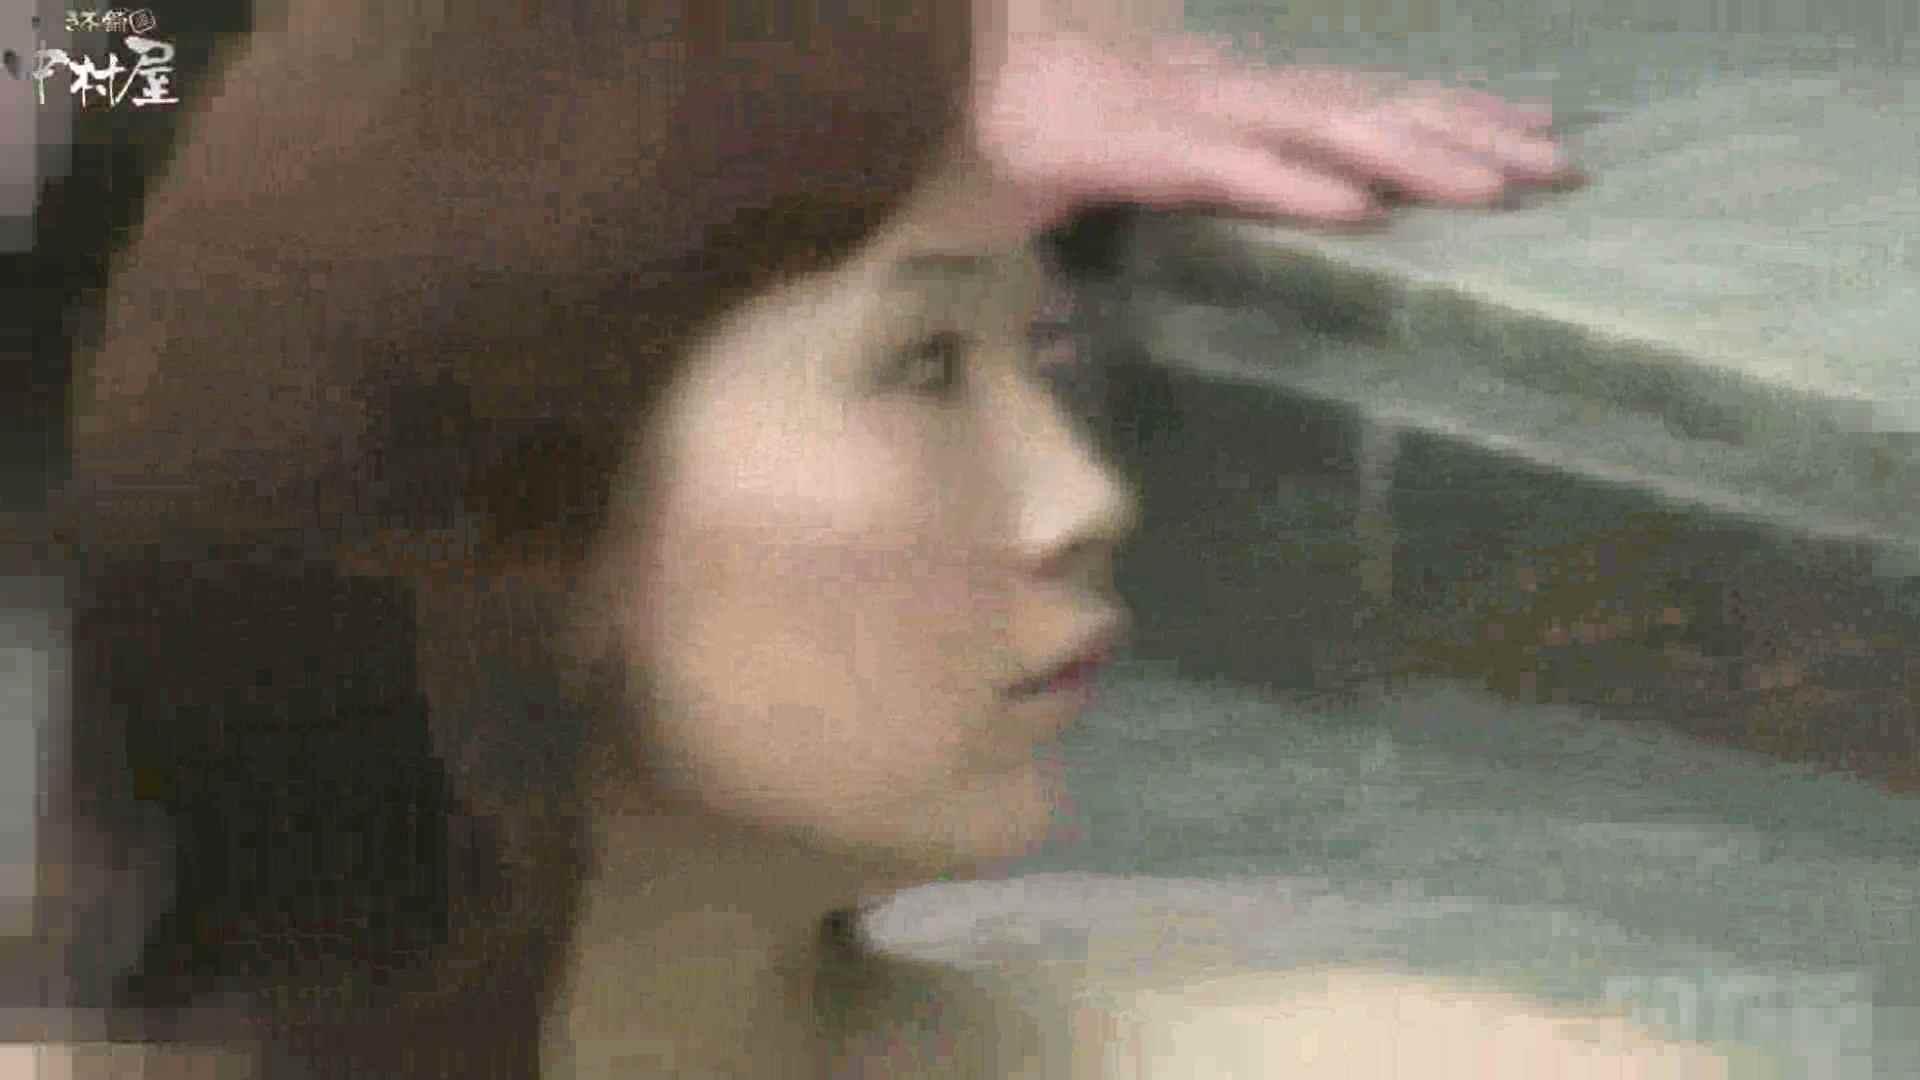 Aquaな露天風呂Vol.877潜入盗撮露天風呂十三判湯 其の二 潜入  100PIX 69